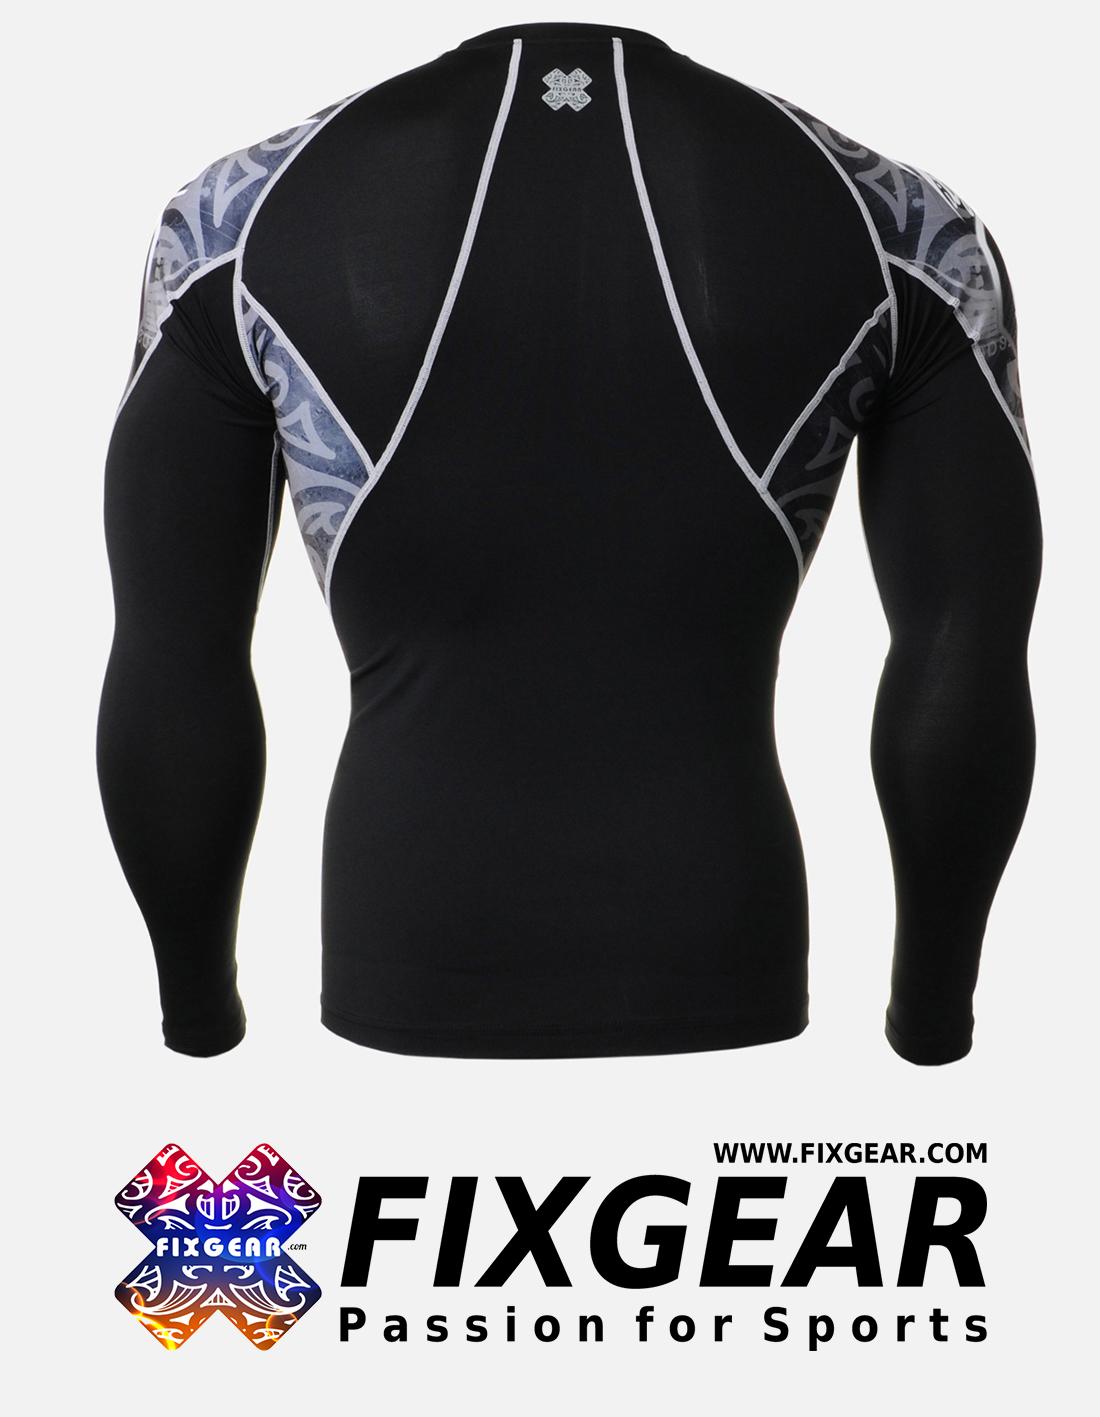 FIXGEAR C2L-B43 Compression Base Layer Shirt